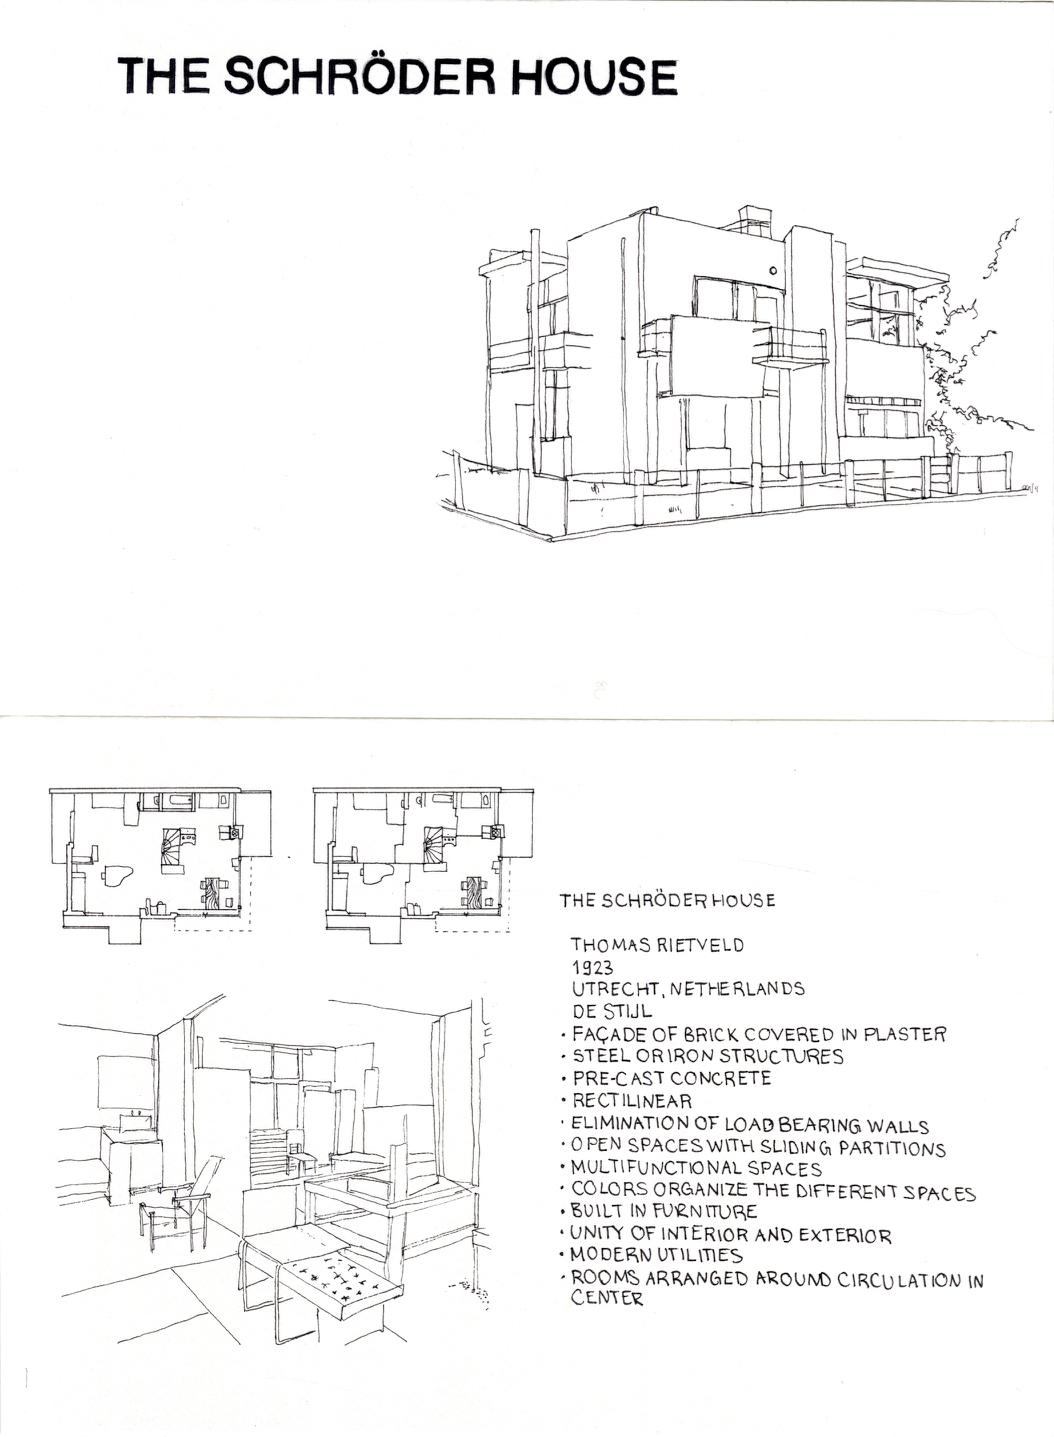 The Schroder House copy.jpg